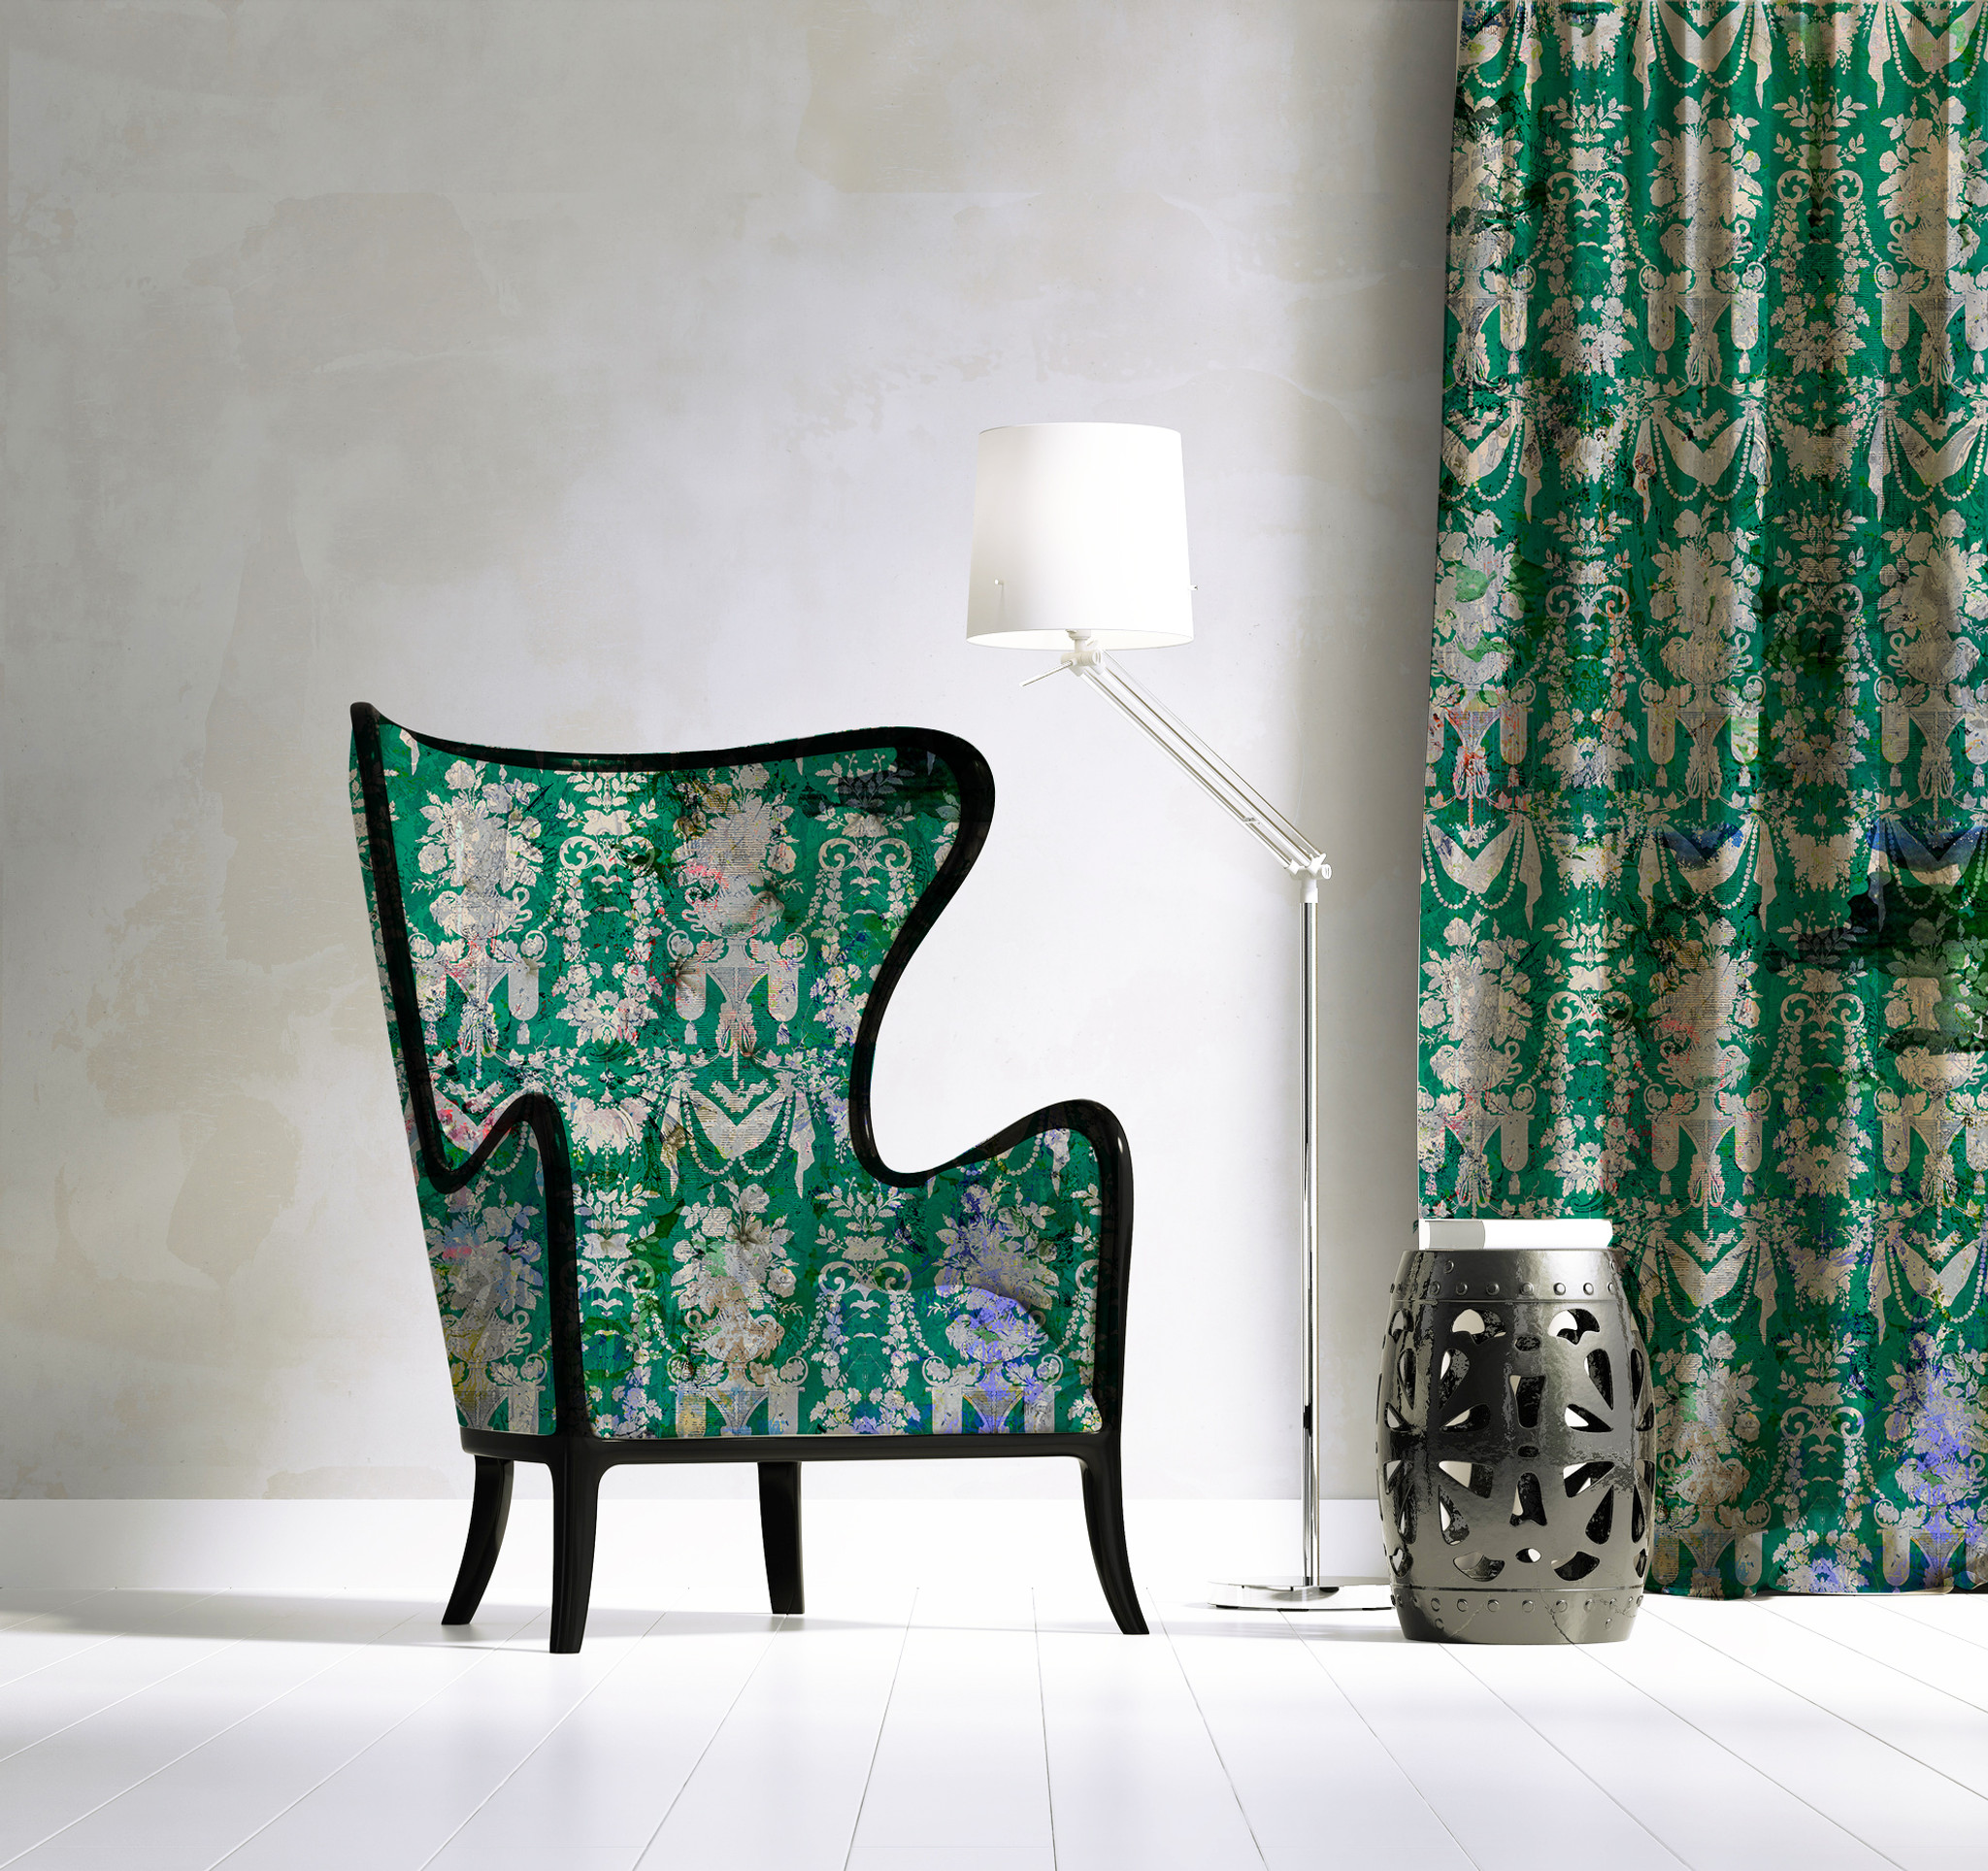 Fabric - So Chic - So Envious